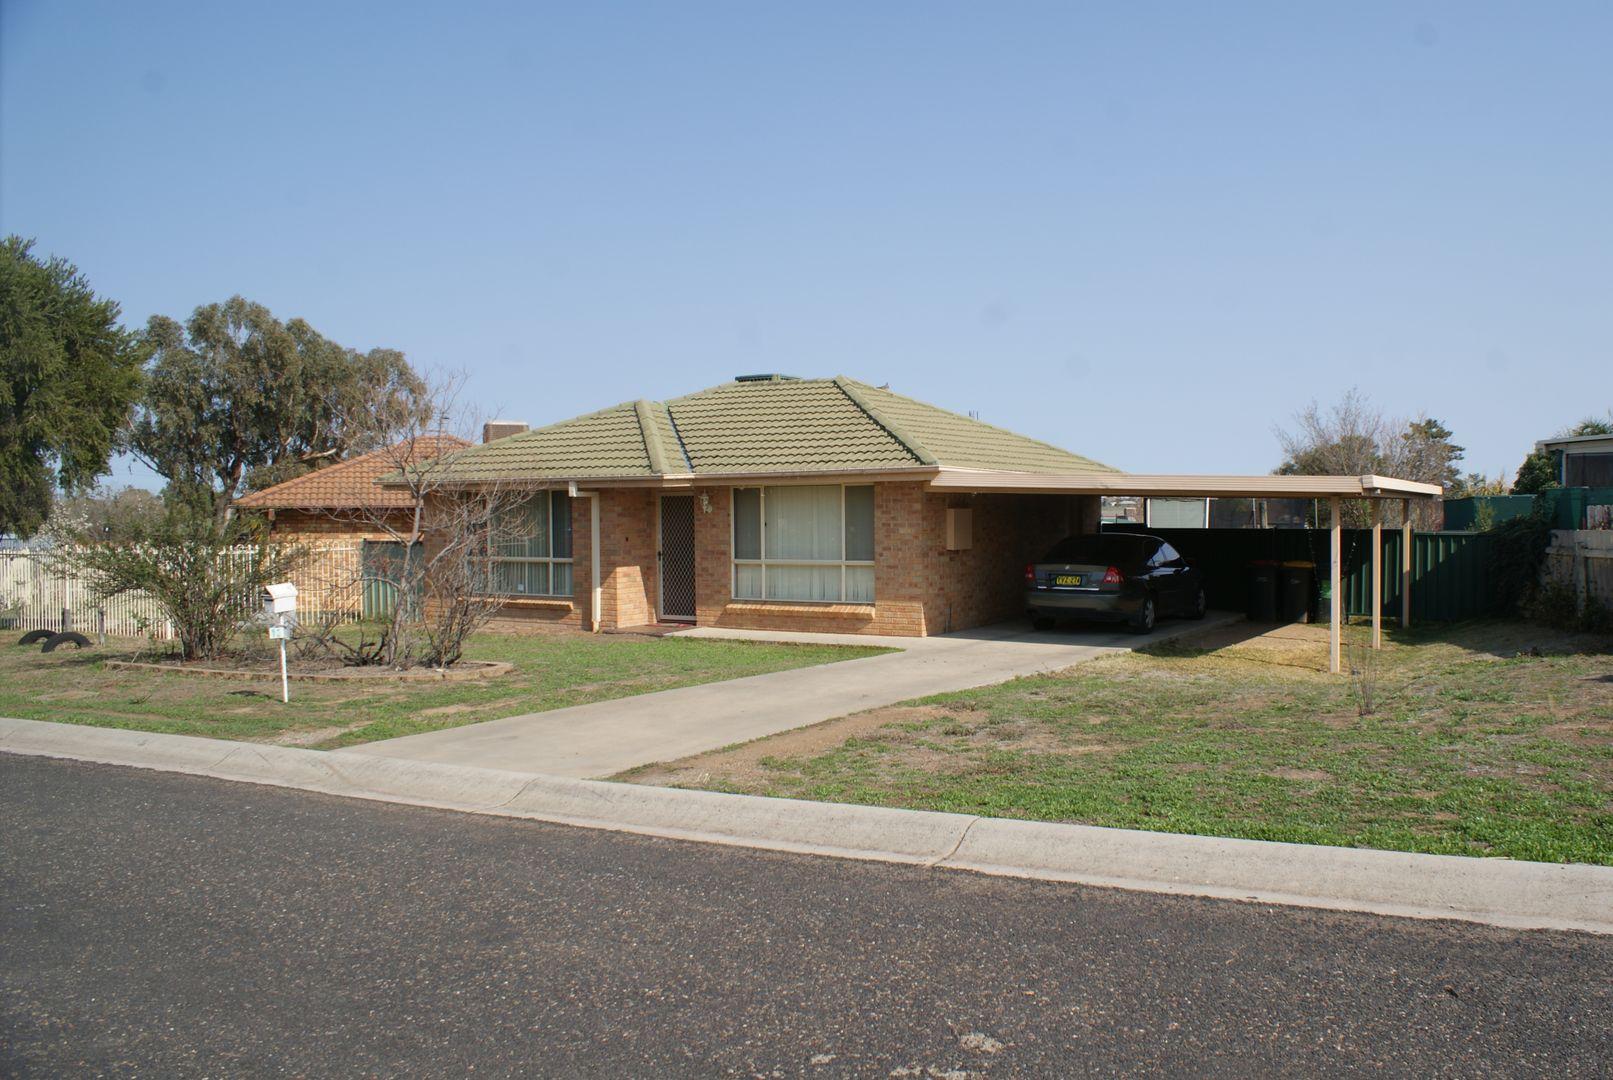 13 Dewhurst St, Tamworth NSW 2340, Image 0